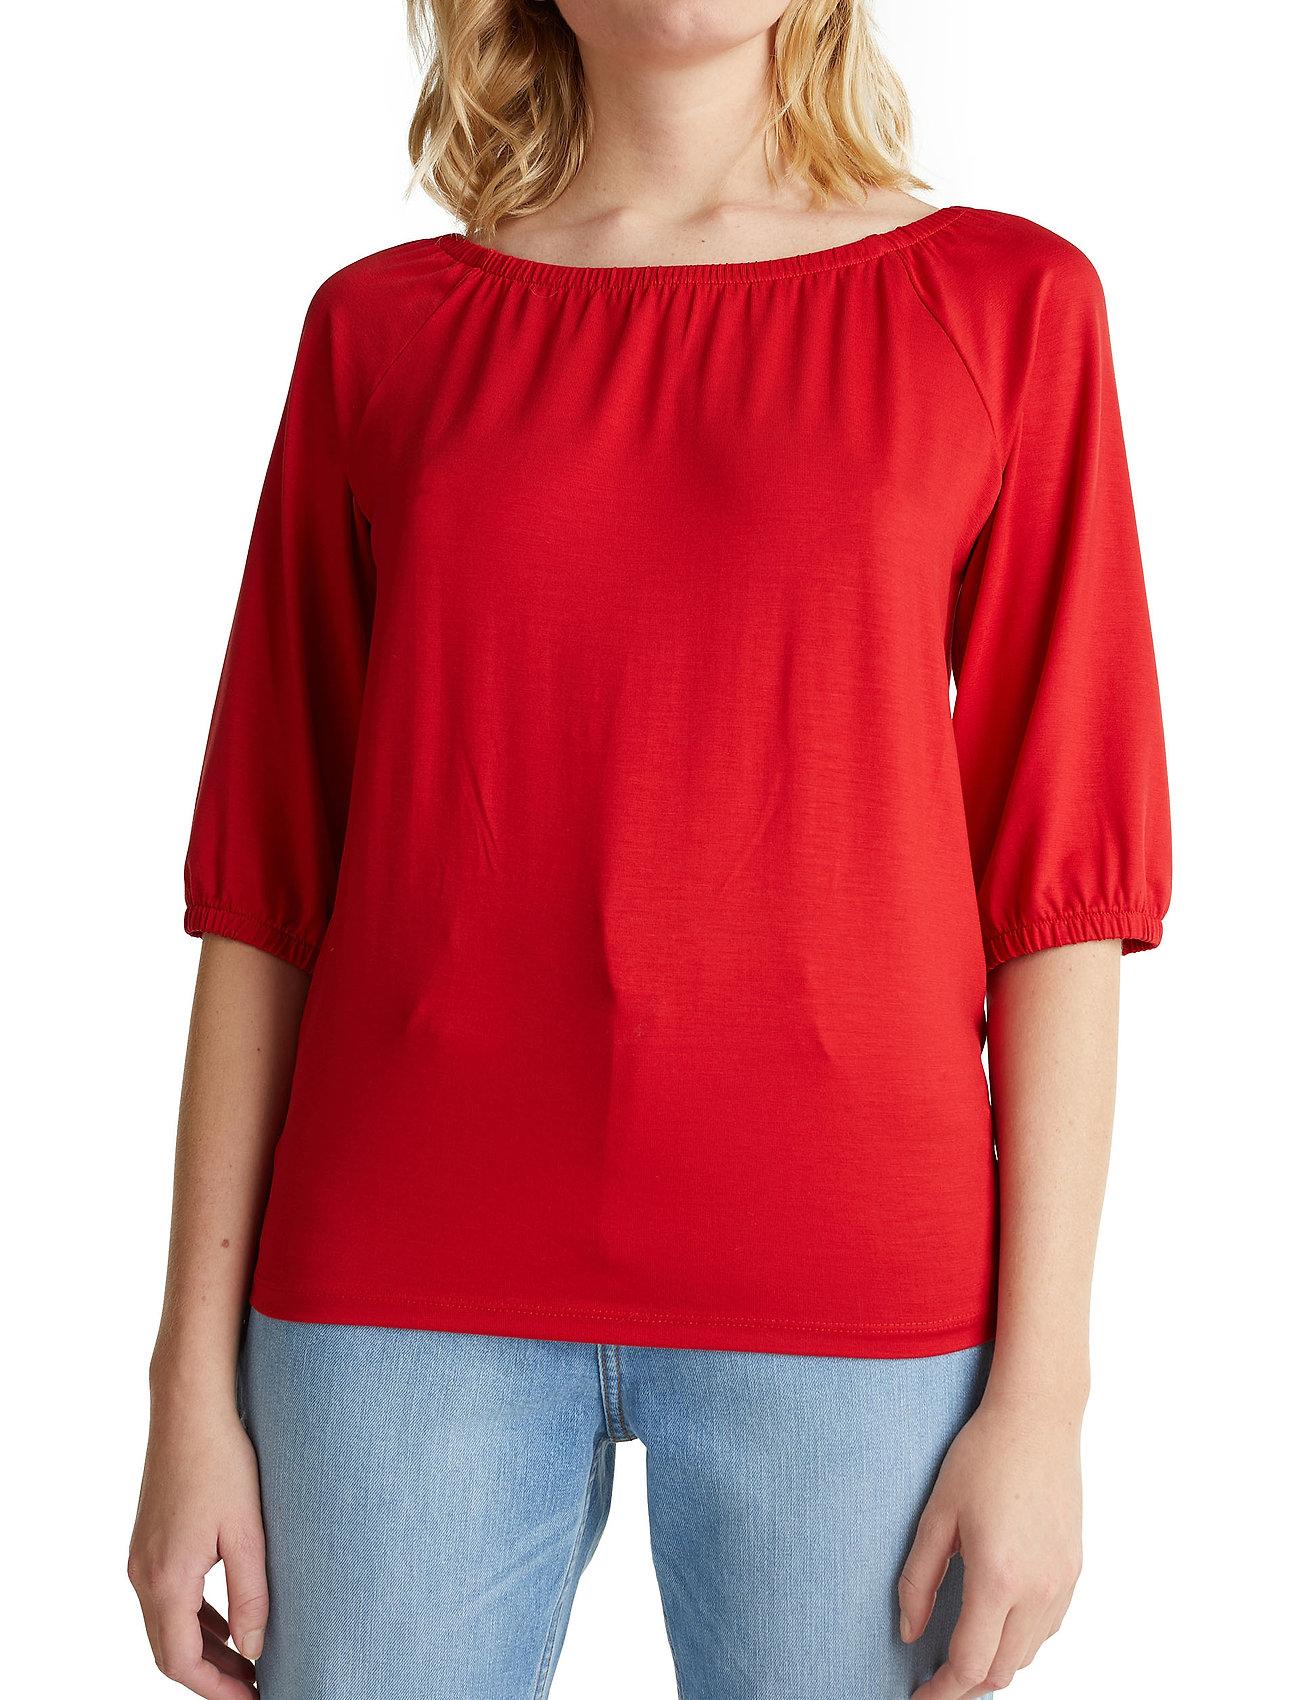 Esprit Casual - T-Shirts - basic t-shirts - dark red - 0